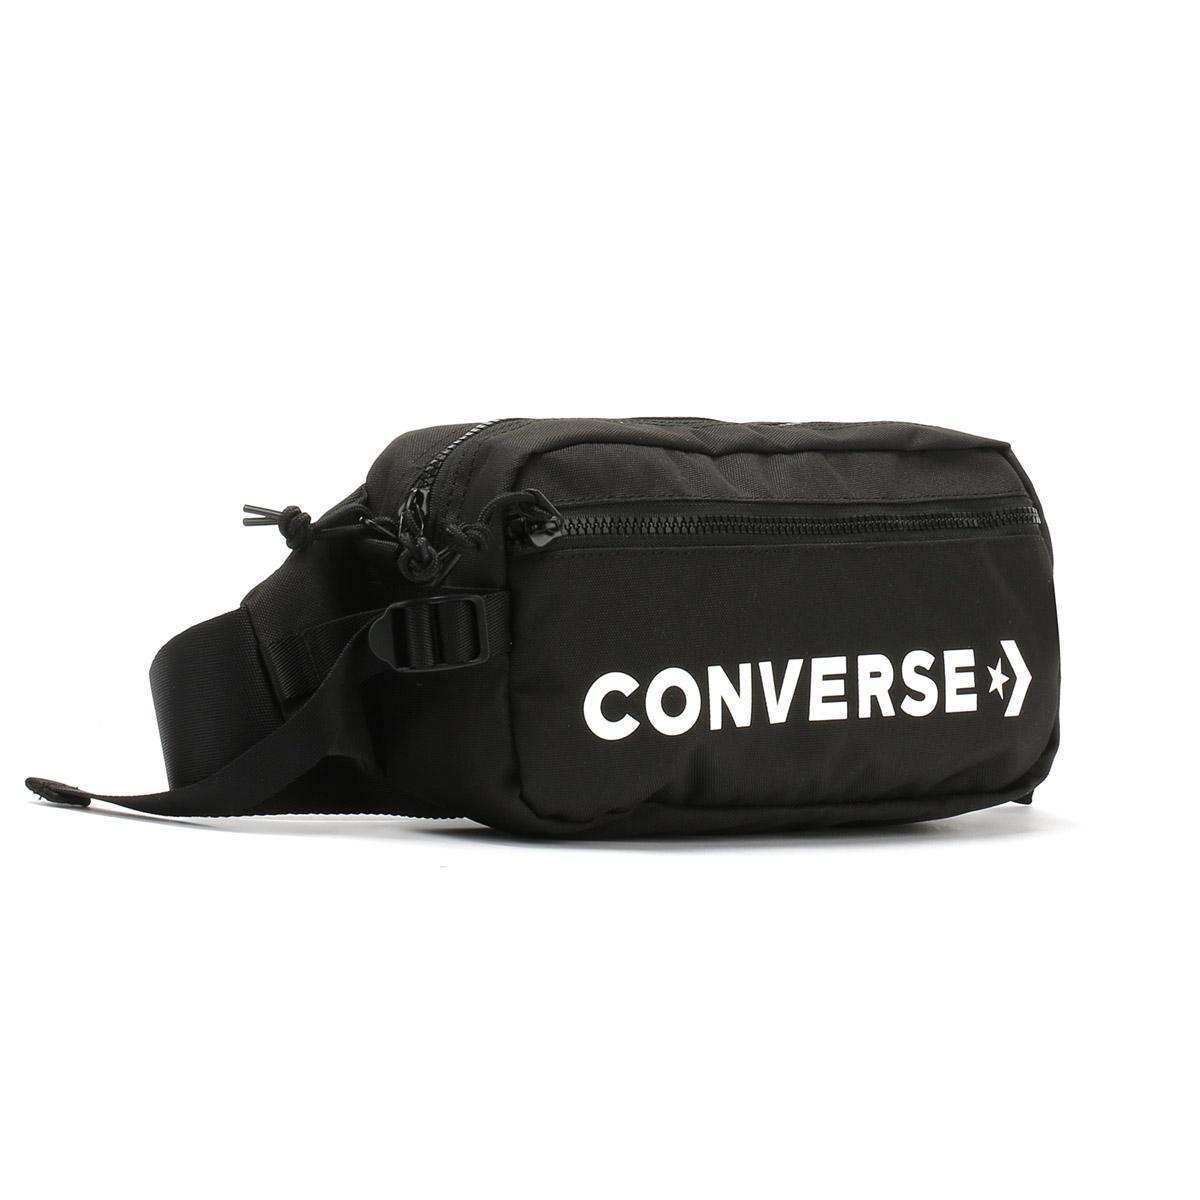 565dabf173 Lyst - Converse Black   White Fast Pack Sling Bag in Black for Men